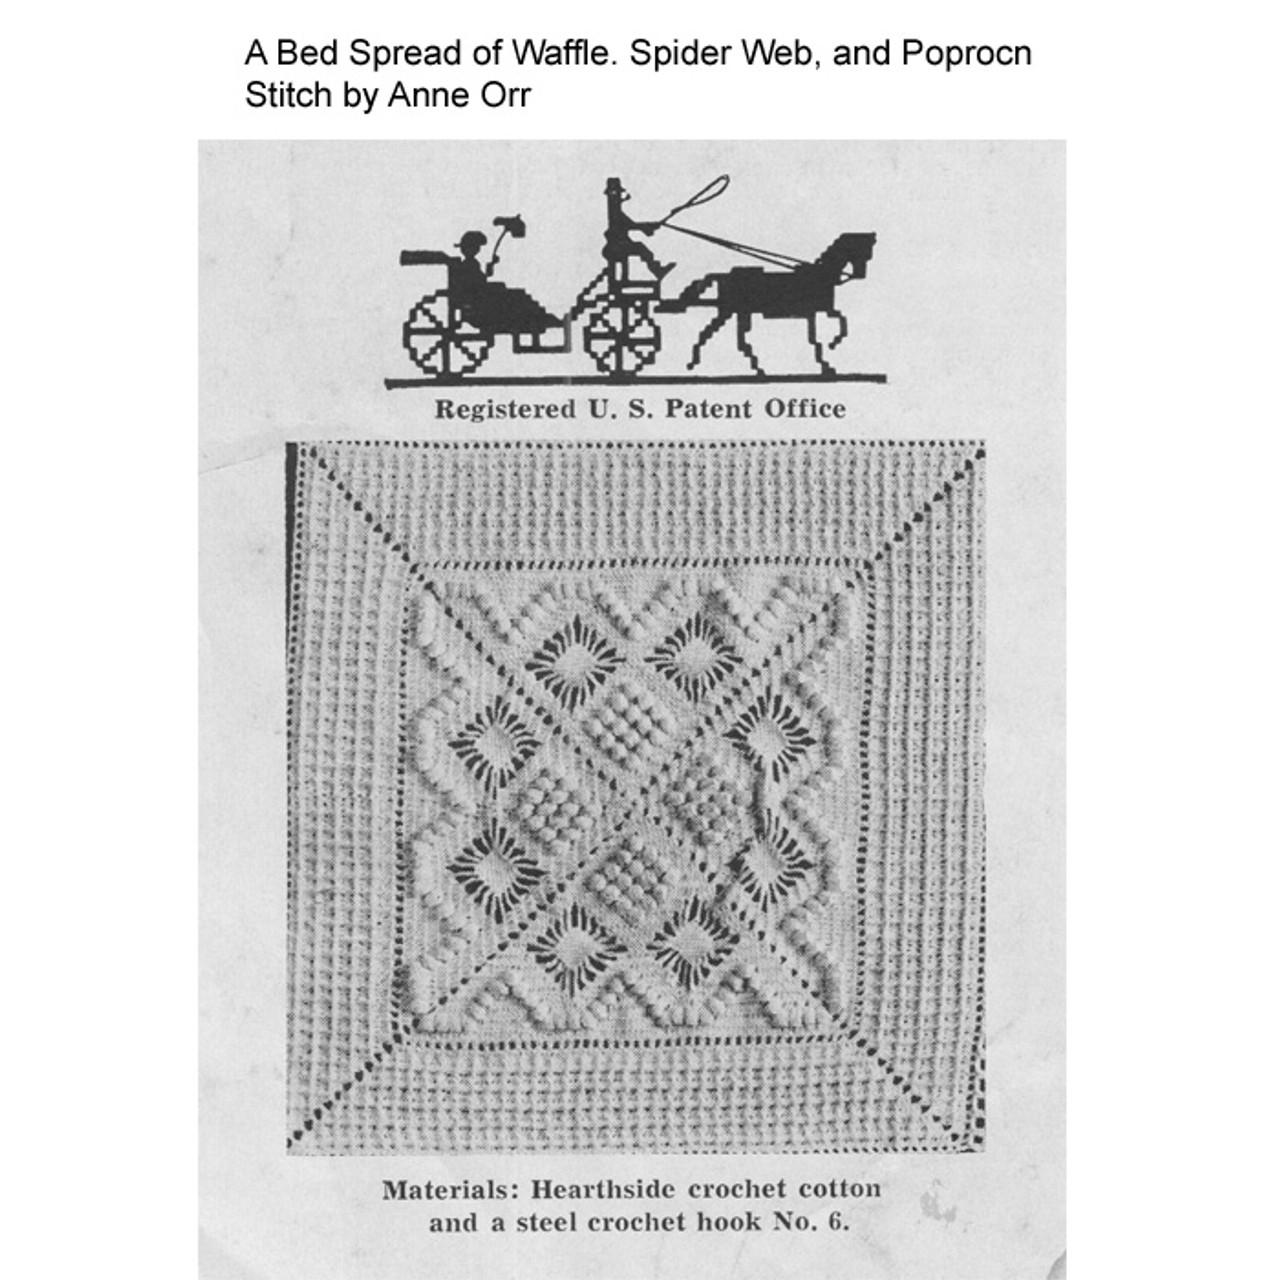 Anne Orr crochet bedspread square in waffle stitch